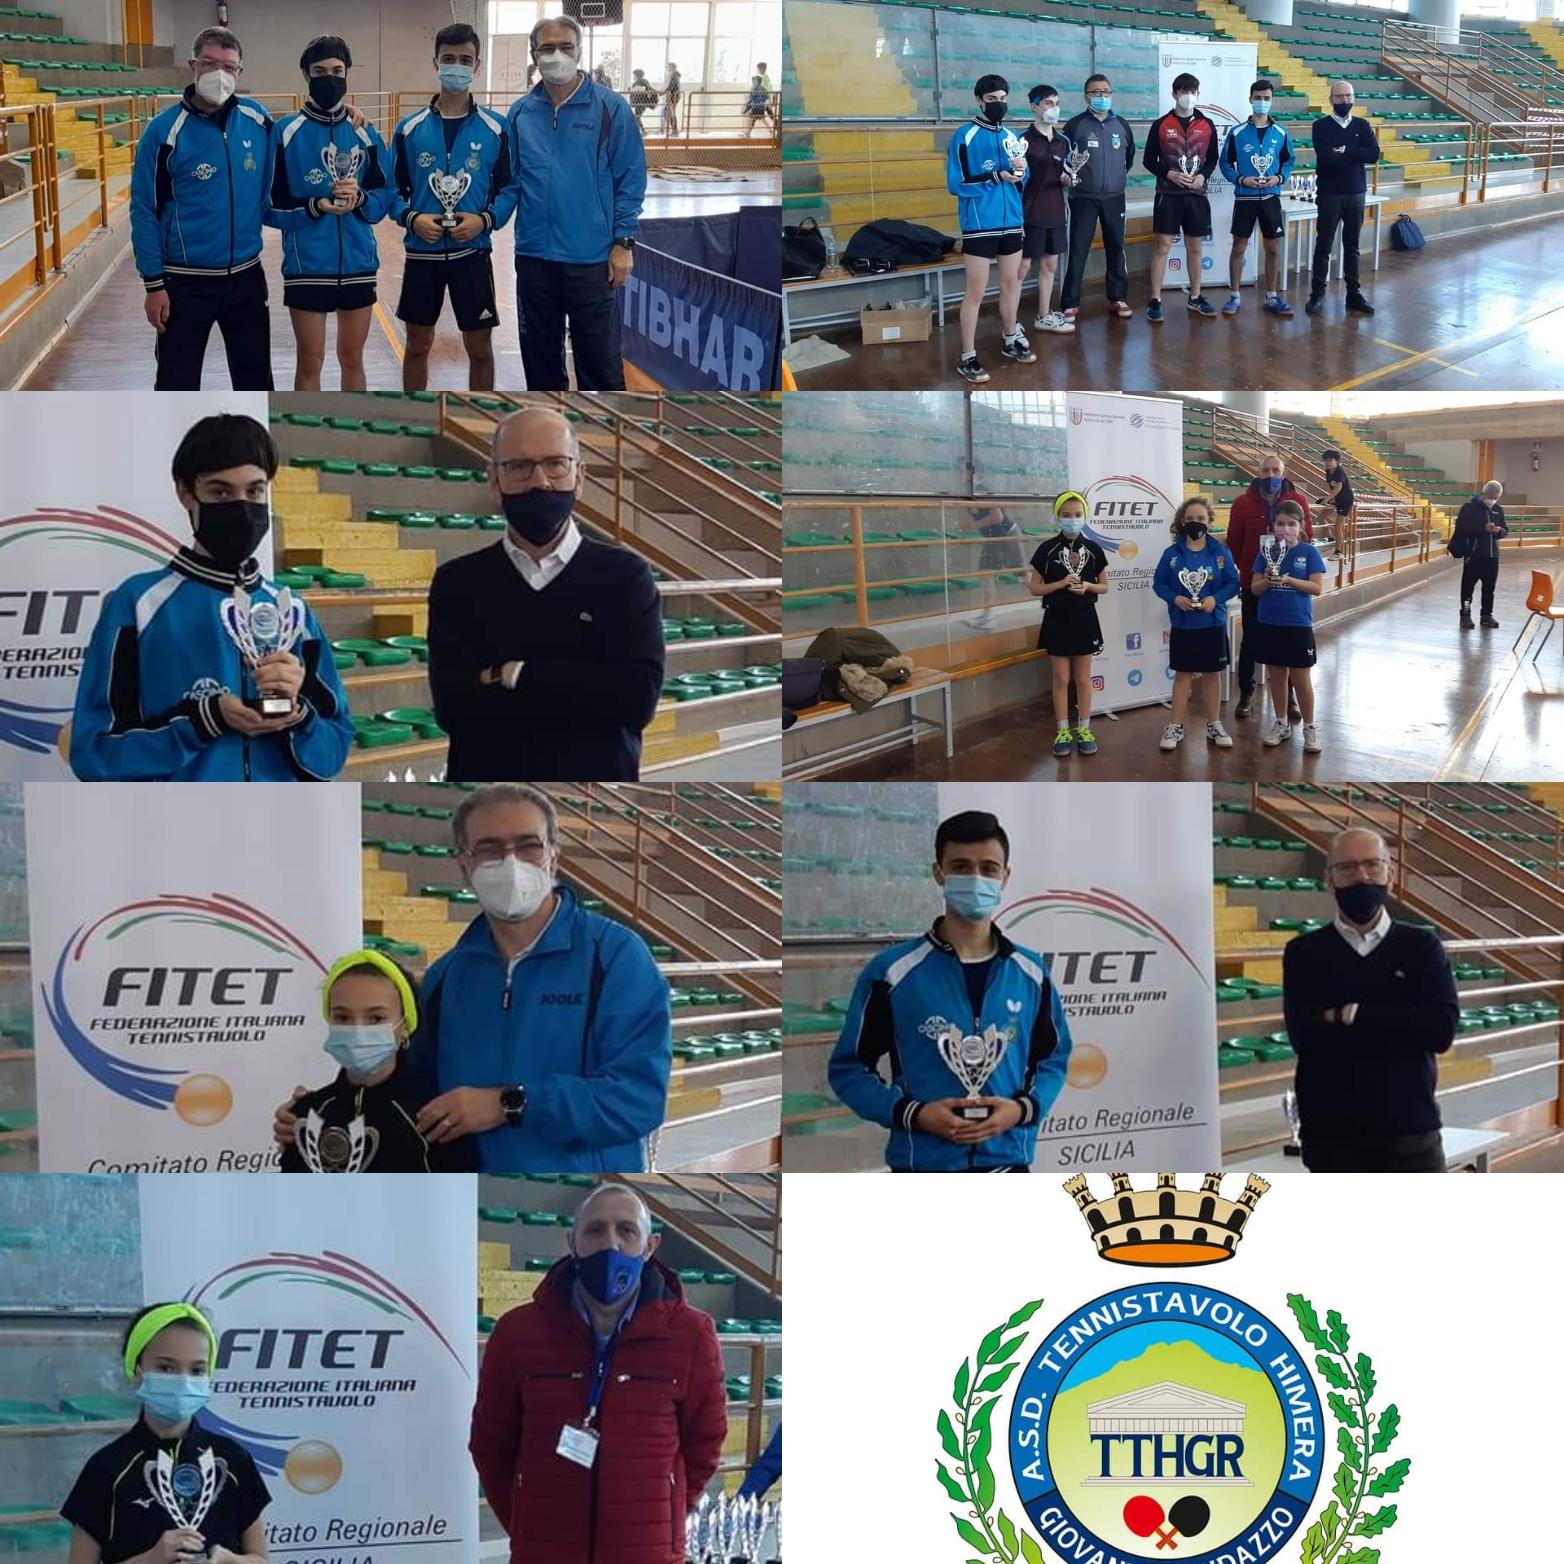 II Torneo Regionale Giovanile e 1^ Torneo Regionale di Categoria 4^ e 5^ M/F